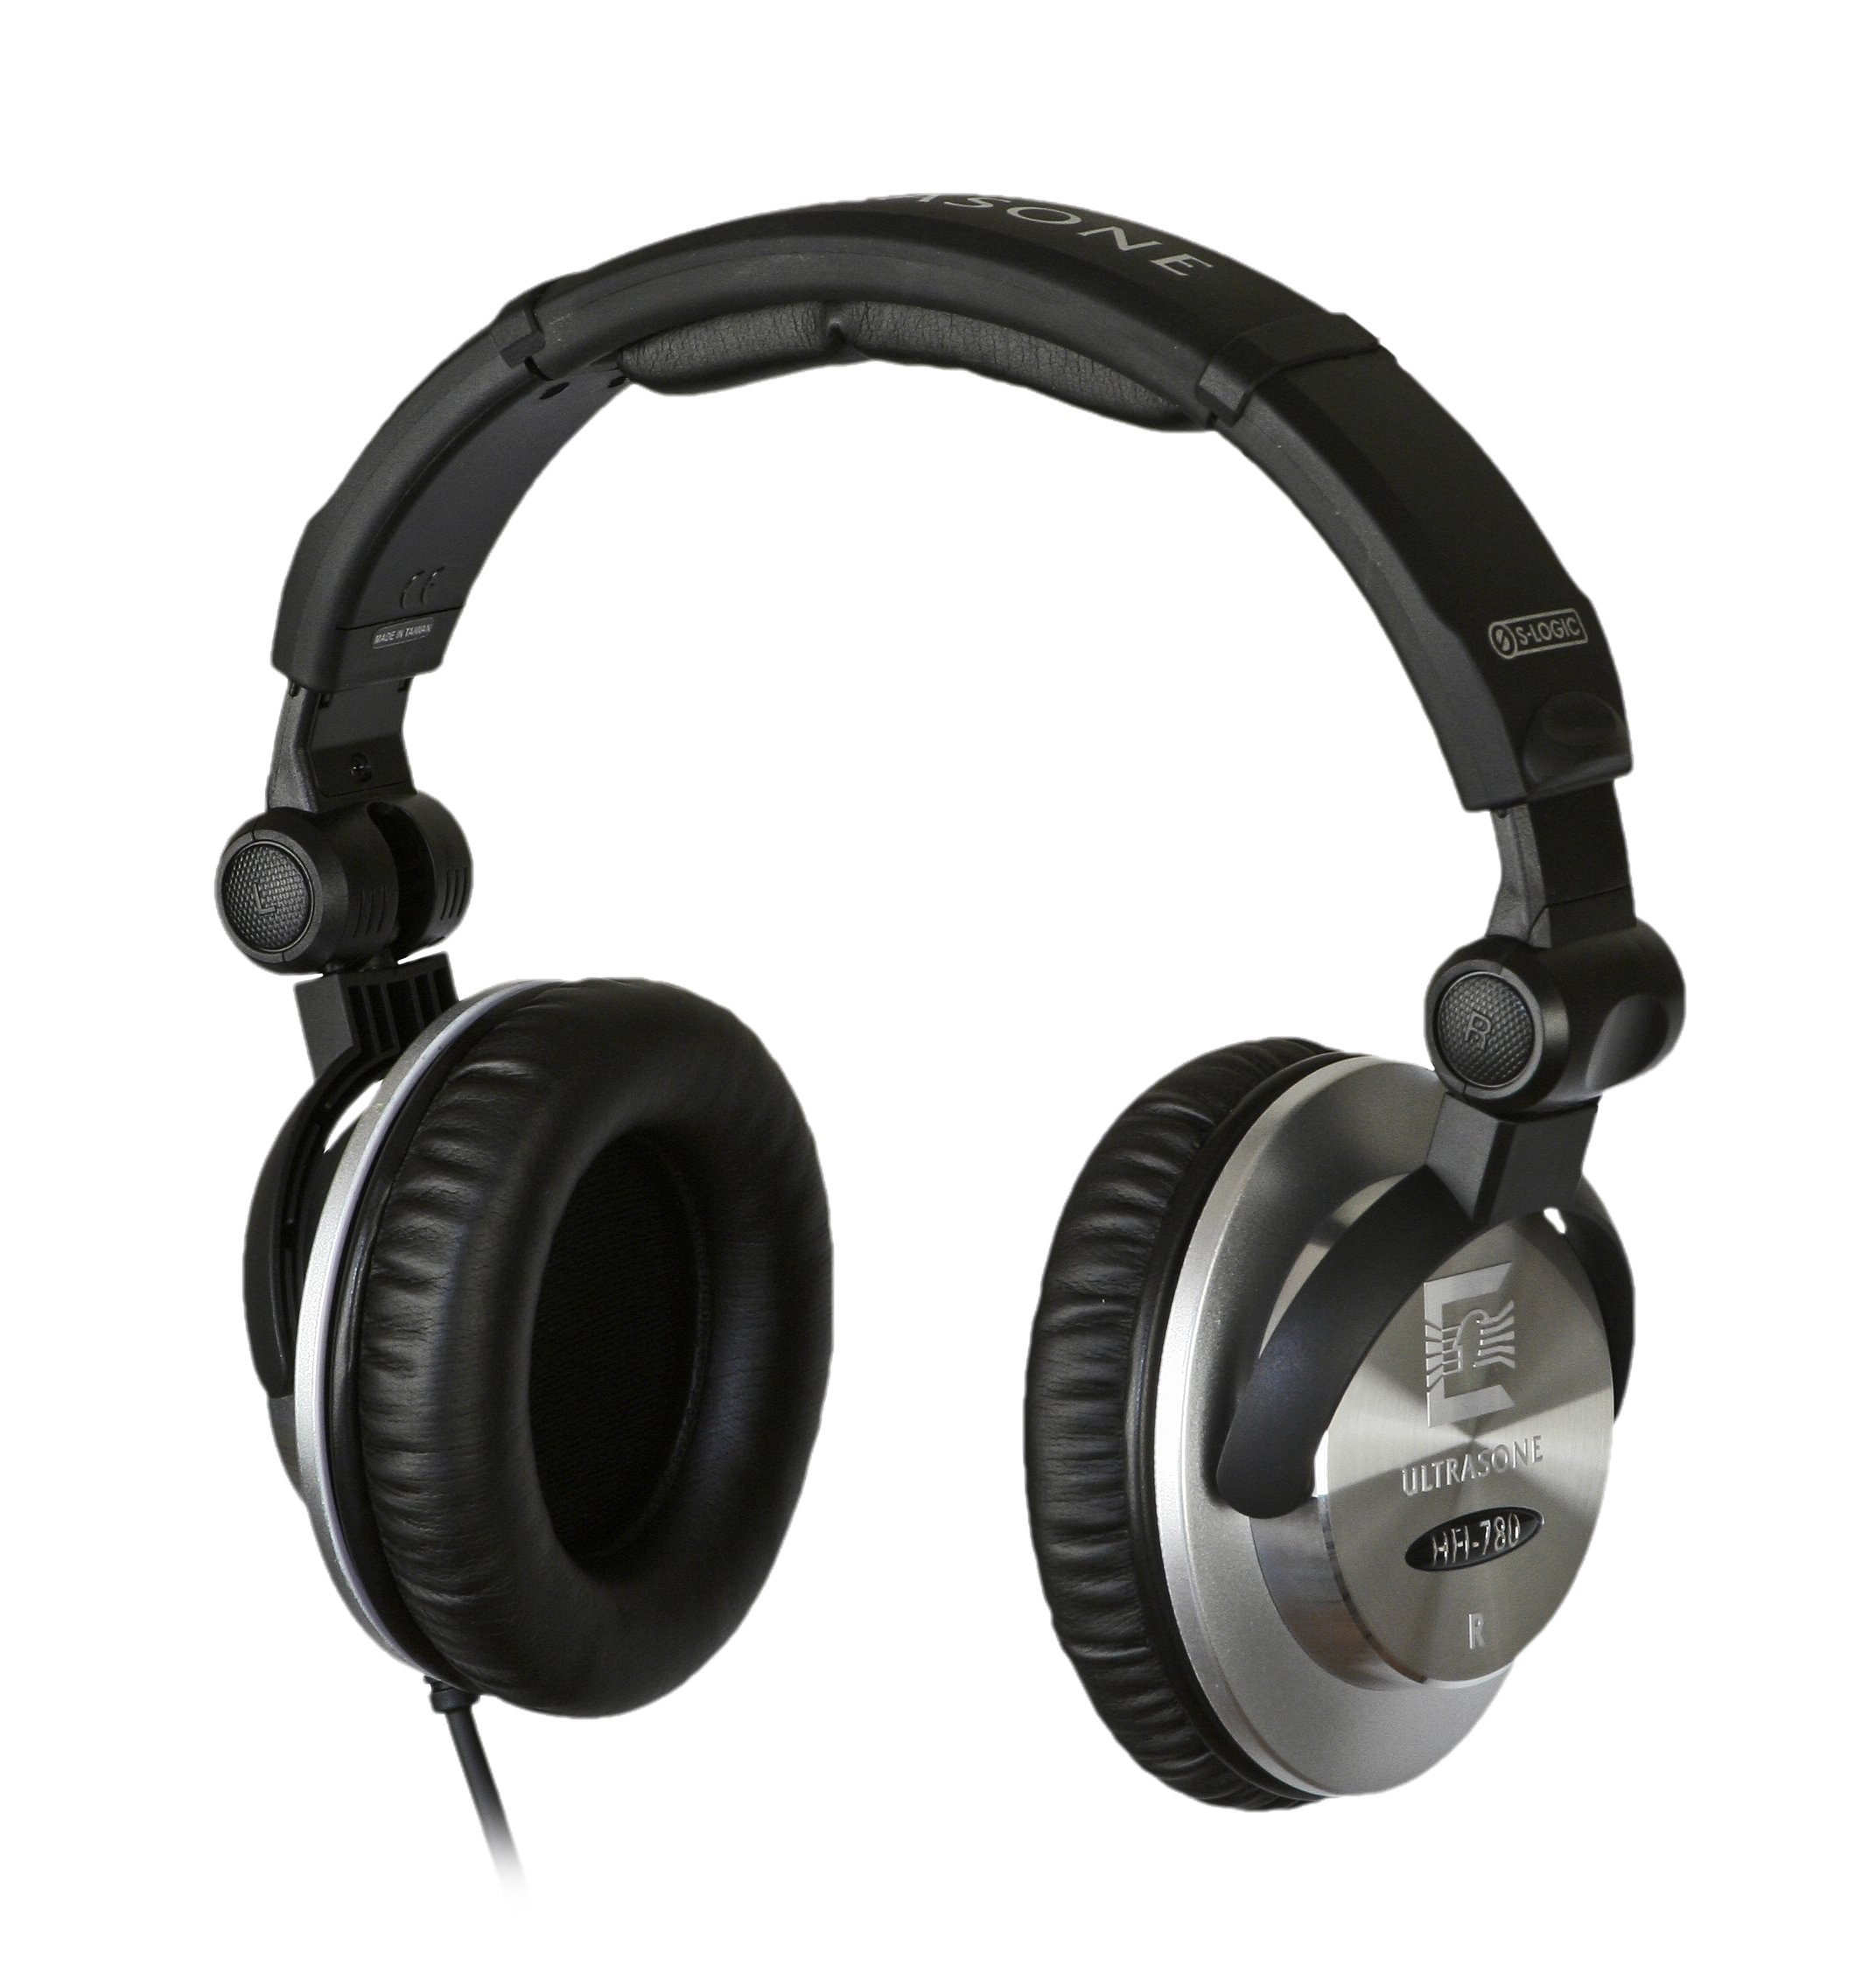 Ultrasone HFI-780 S-Logic Surround Sound Professional Closed-back Headphones with Transport Bag by Ultrasone (Image #1)